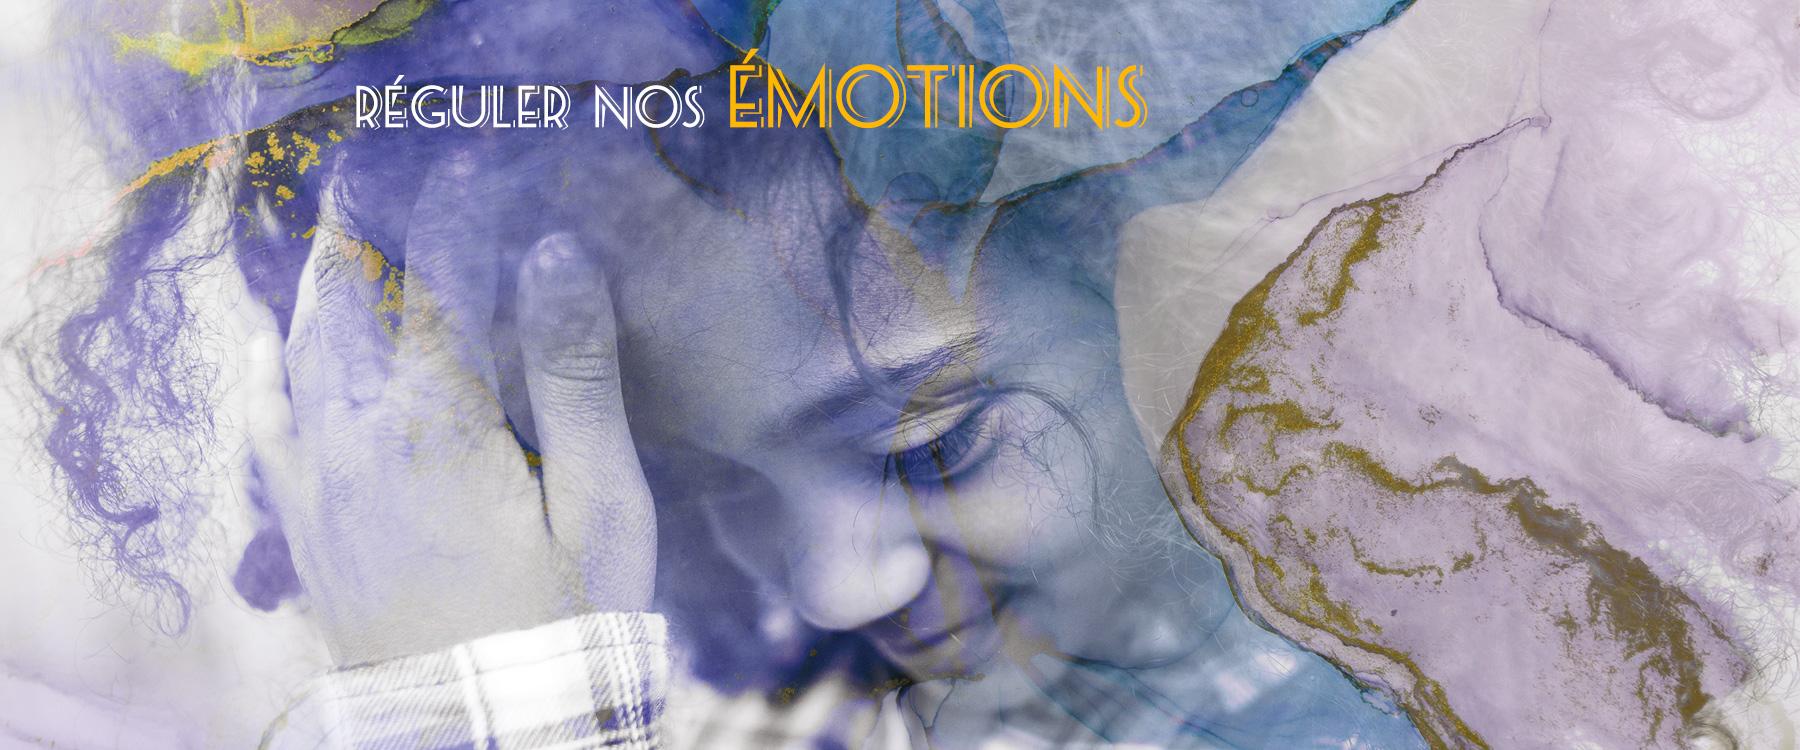 Focus Emotions Magazine Heartfulness